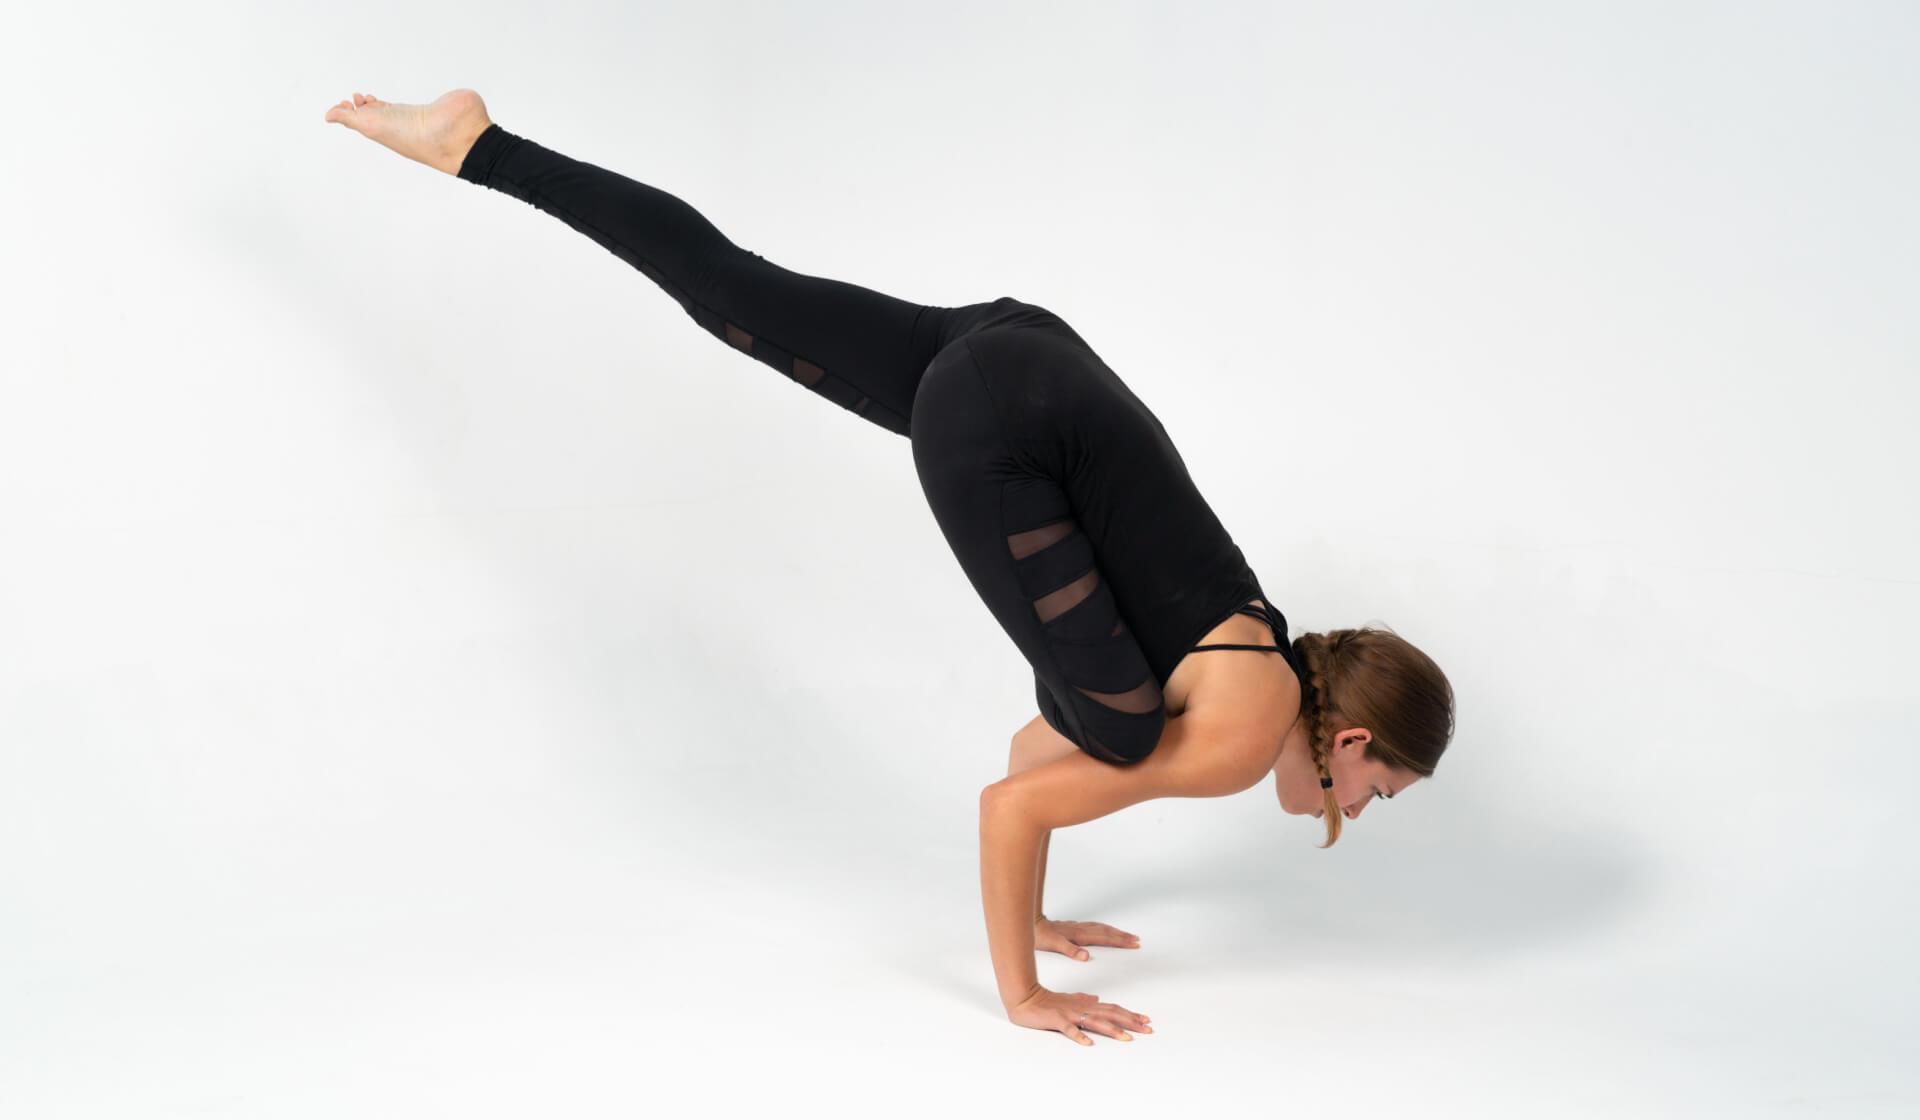 Woman yoga teacher dressed in all black practicing a yoga arm balance pose (flying pigeon pose or eka pada galavasana) against a white backdrop